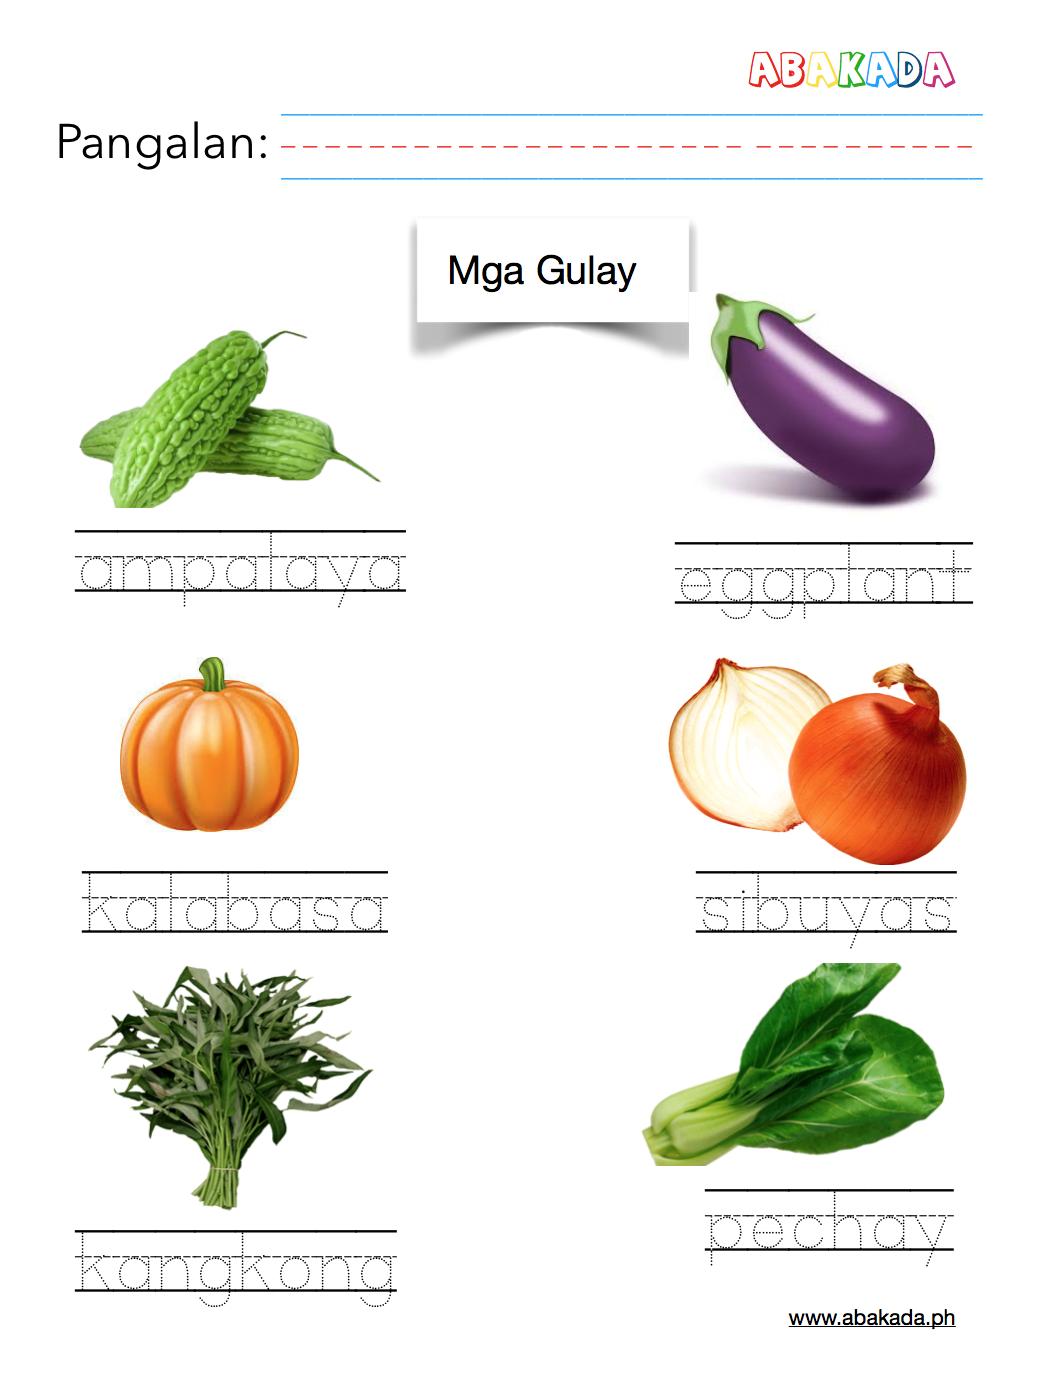 Mga Gulay Elementary Worksheets Tracing Worksheets Preschool 1st Grade Worksheets [ 1388 x 1062 Pixel ]